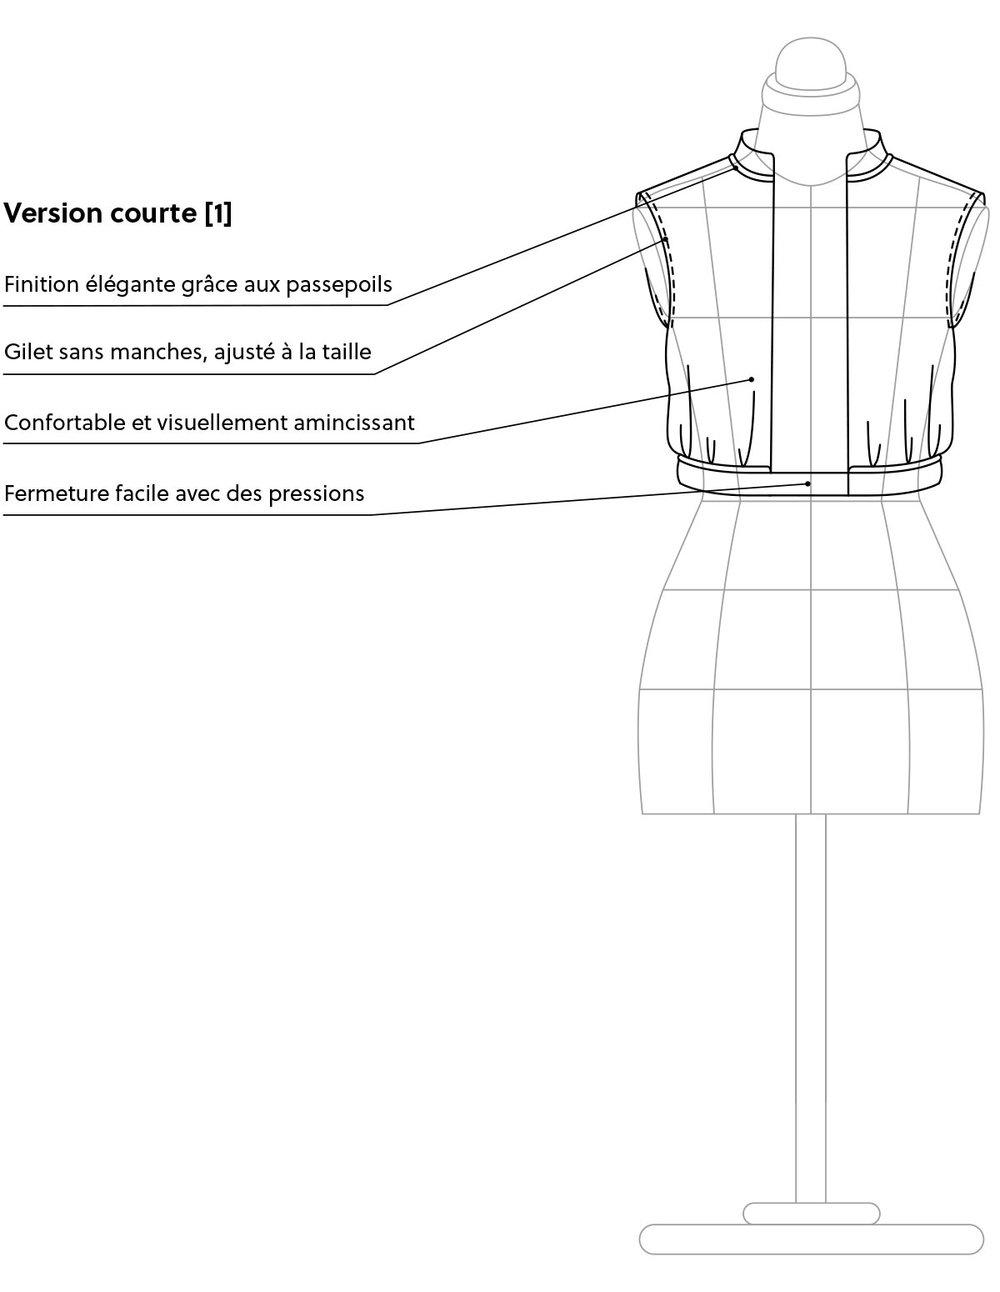 aestiva-features-short-fr.jpg